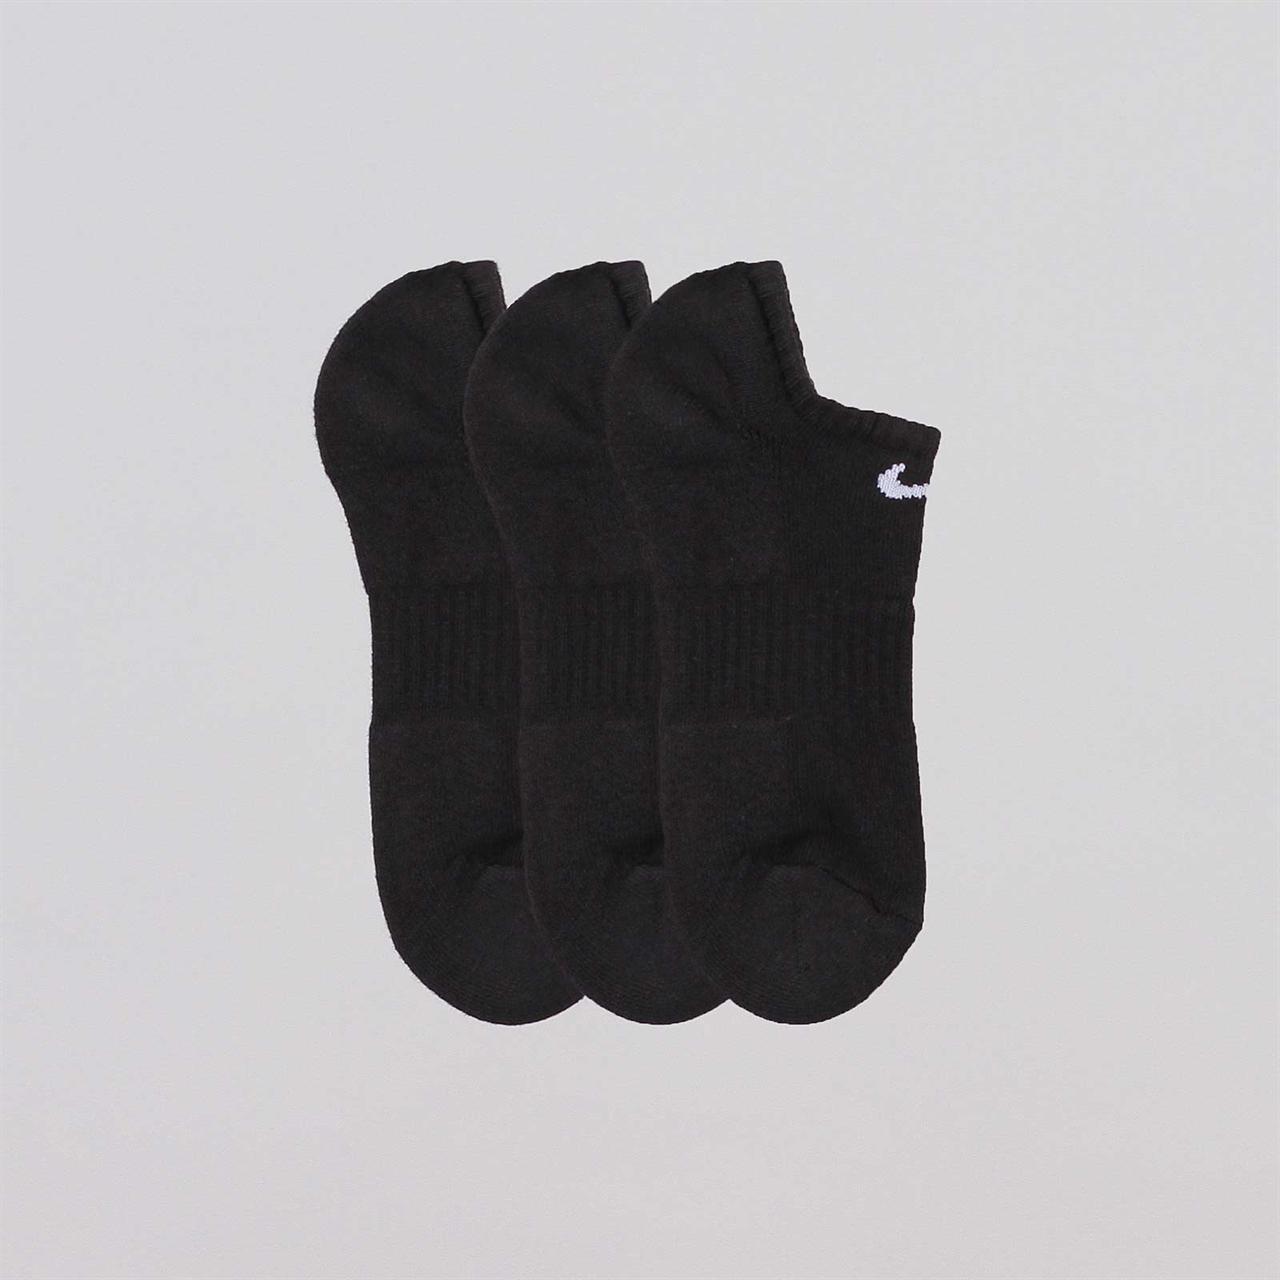 Tất thể thao Nike Everyday Cush Ns 3P SX7673-010